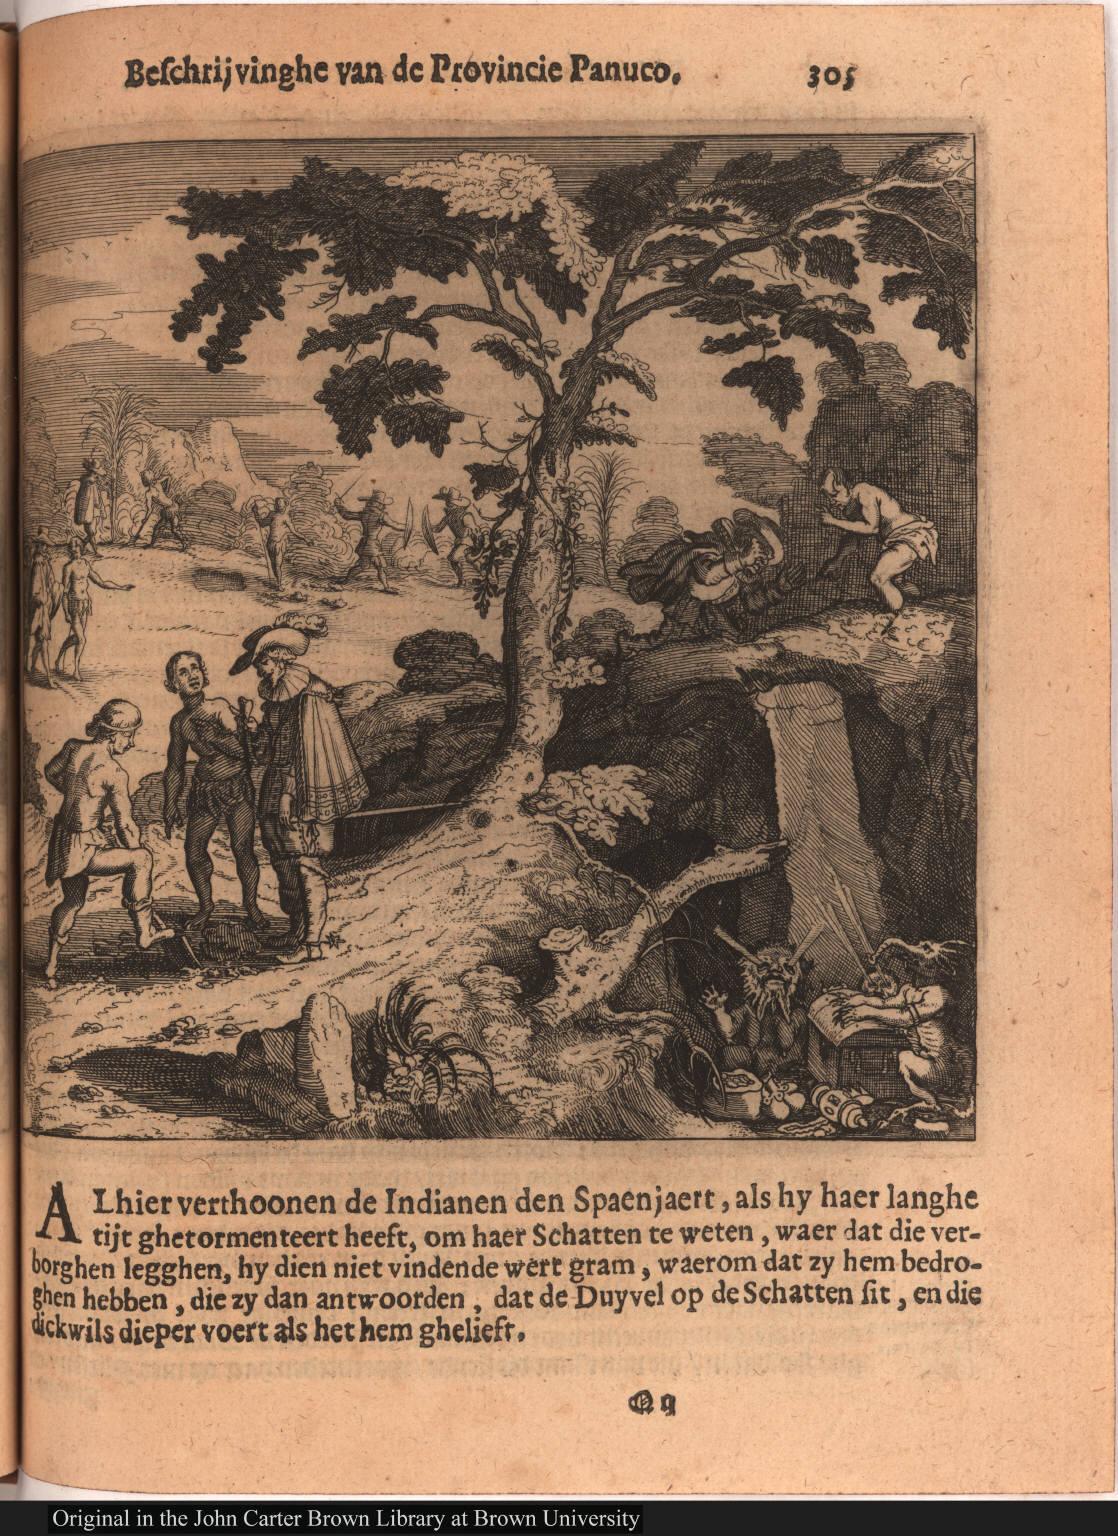 [Spanish discover cache of Aztec treasure]